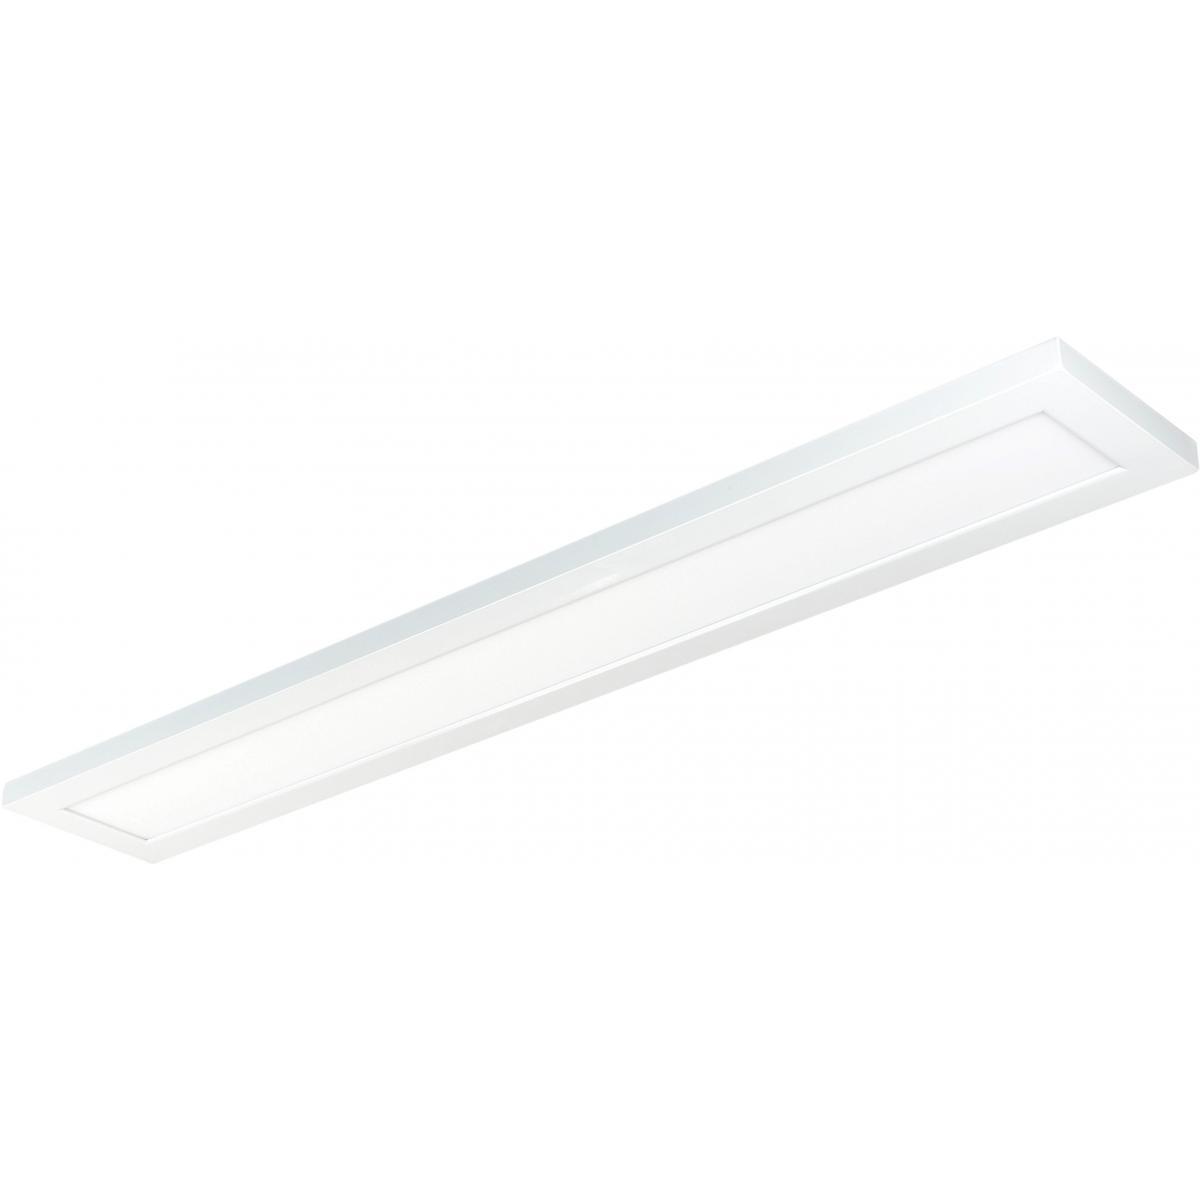 62-1156 30W/LED/5